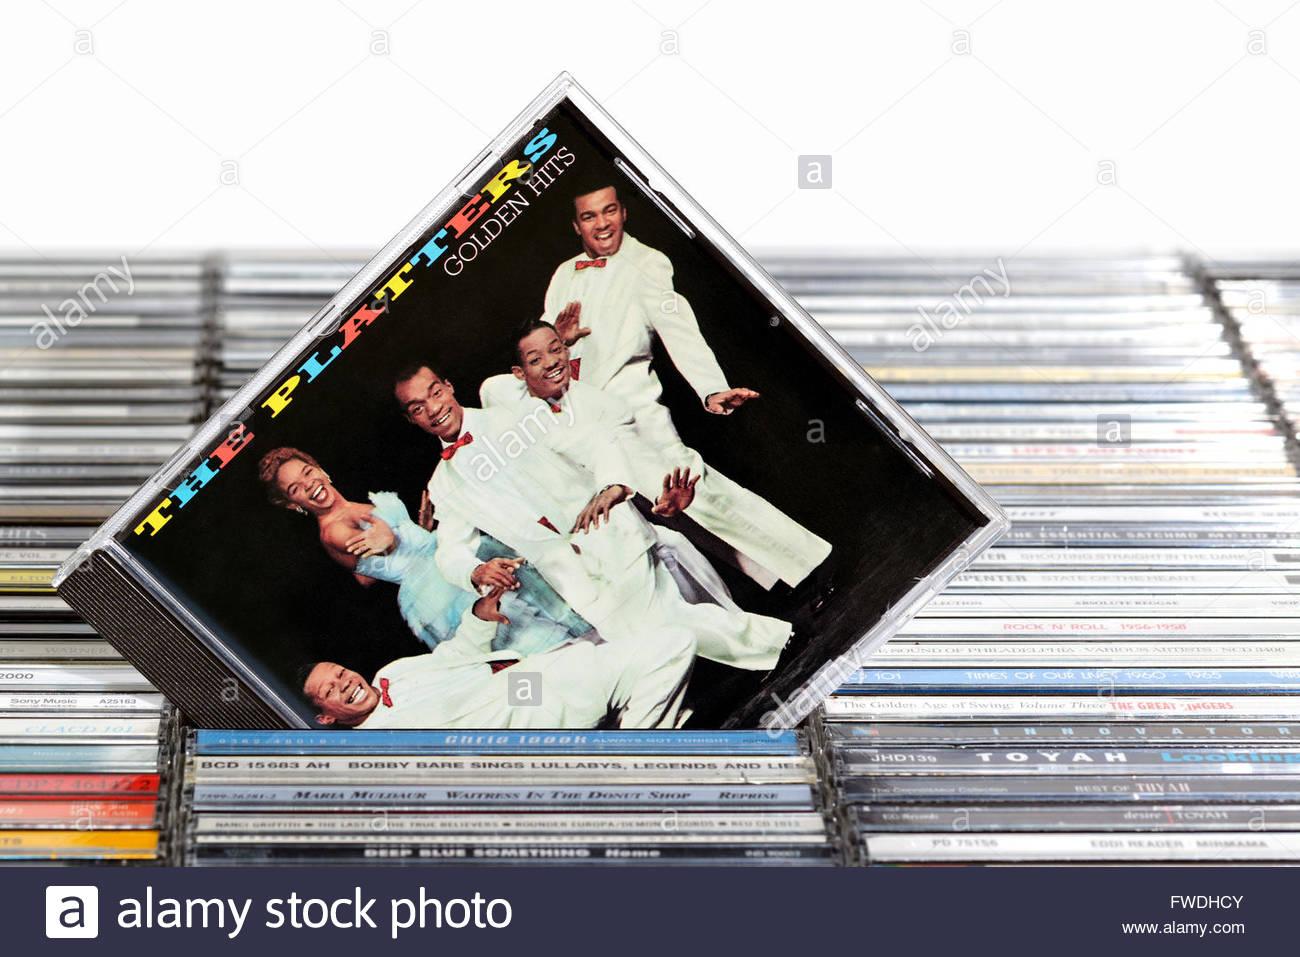 The Platters Golden Hits album, piled music CD cases, Dorset England - Stock Image